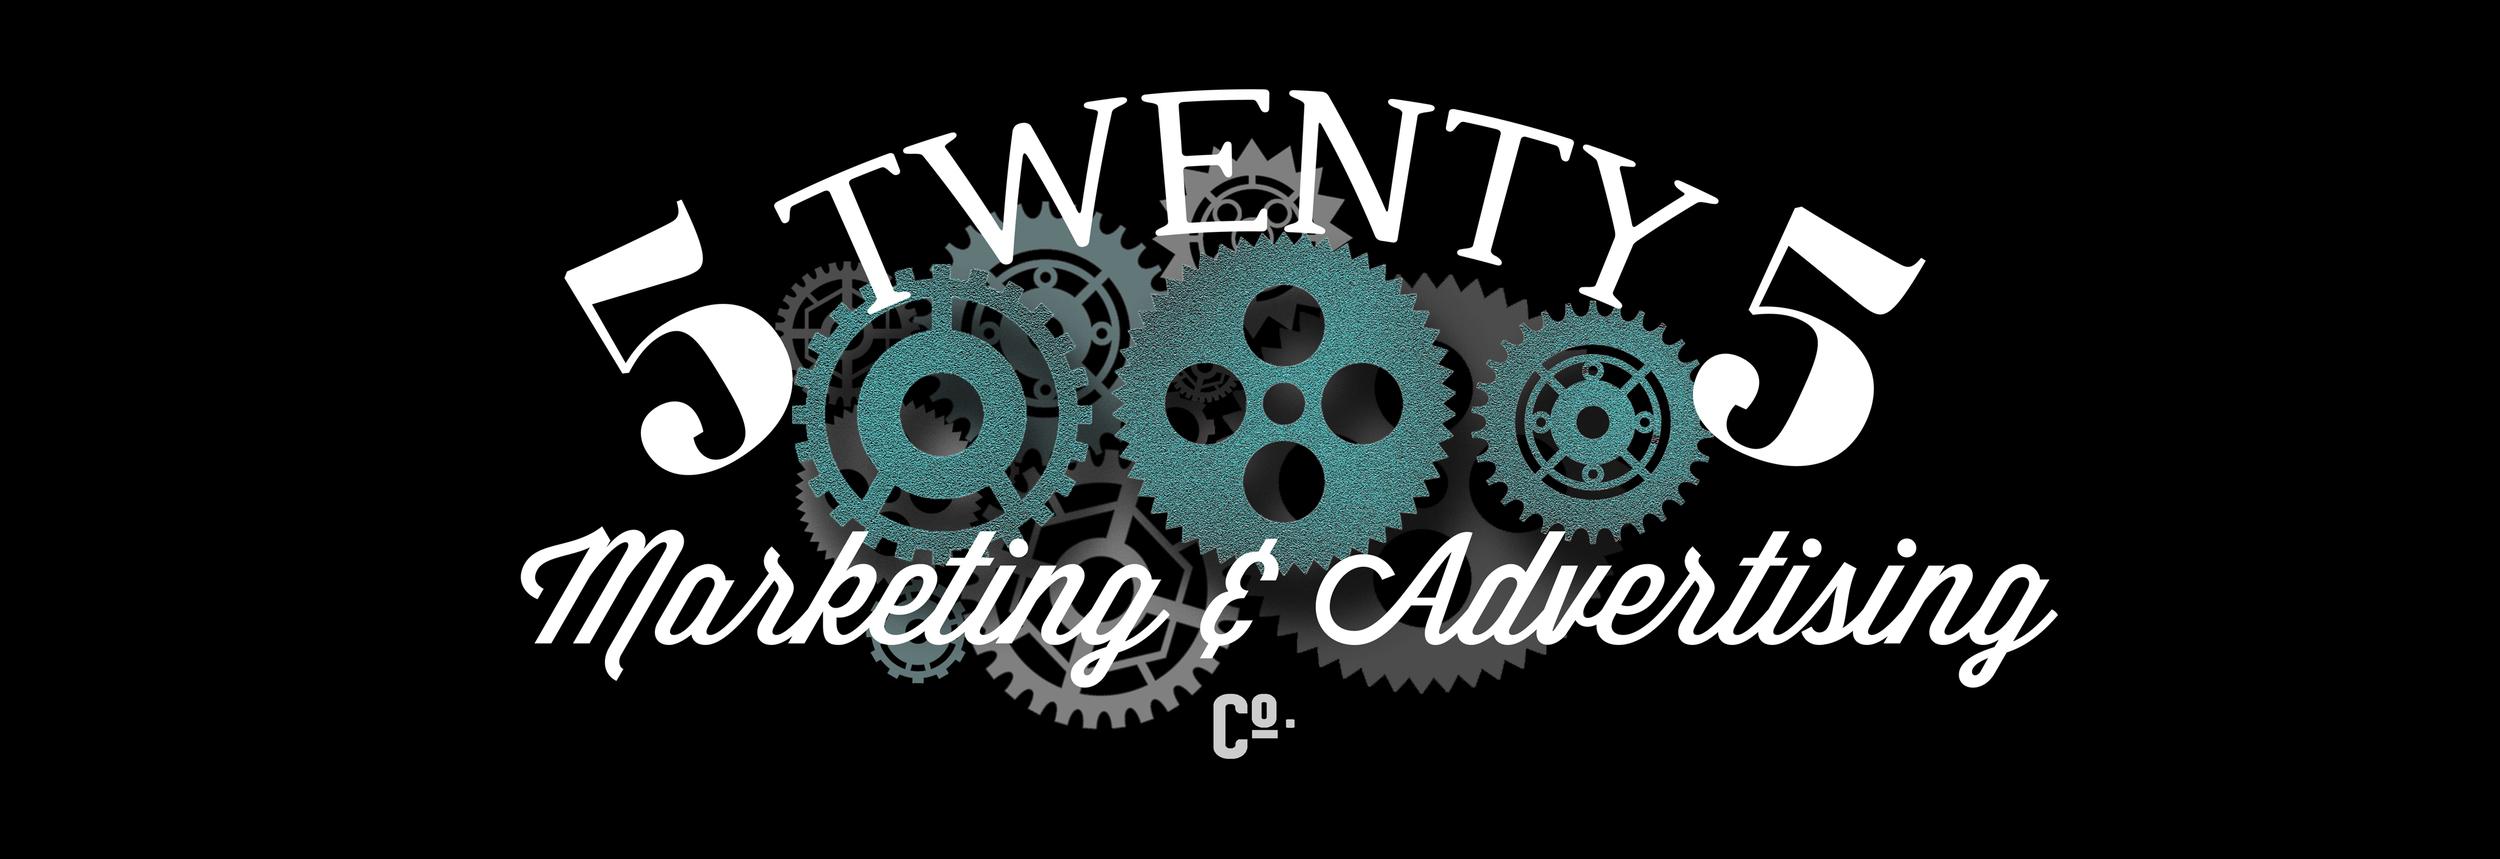 5twenty5 marketing and advertising logo